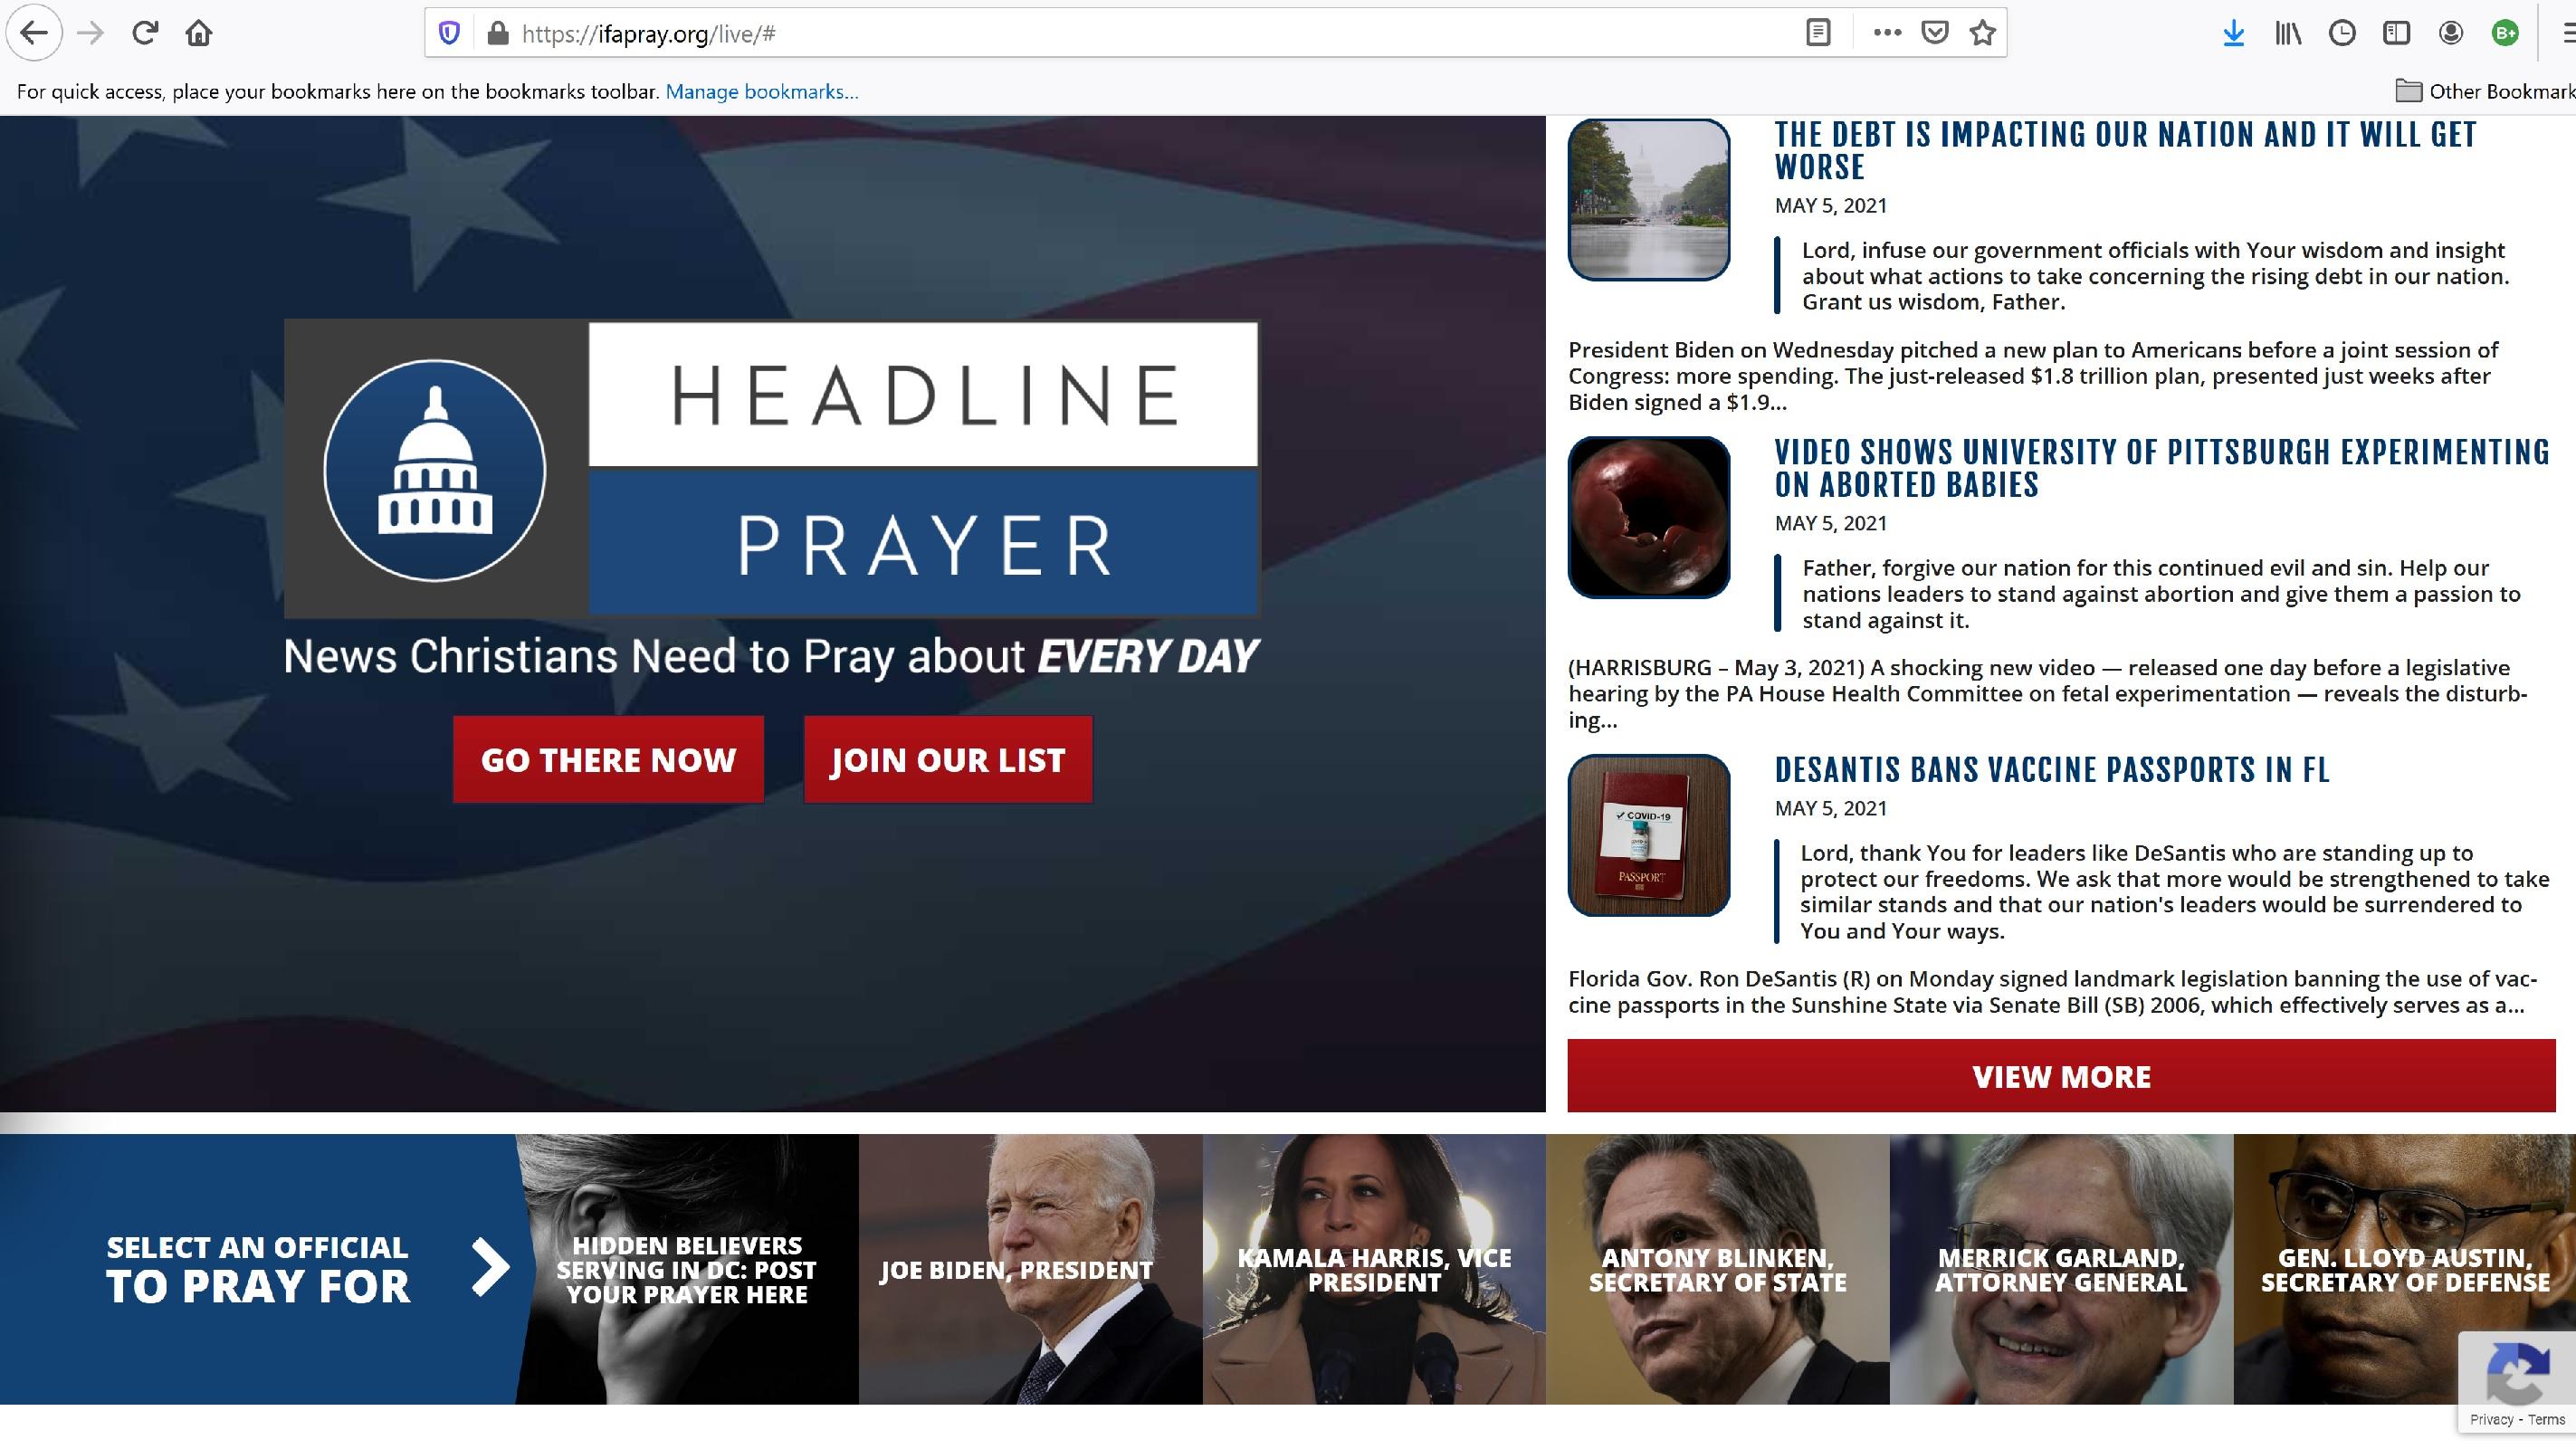 2021-05-05 WW Headline Prayer